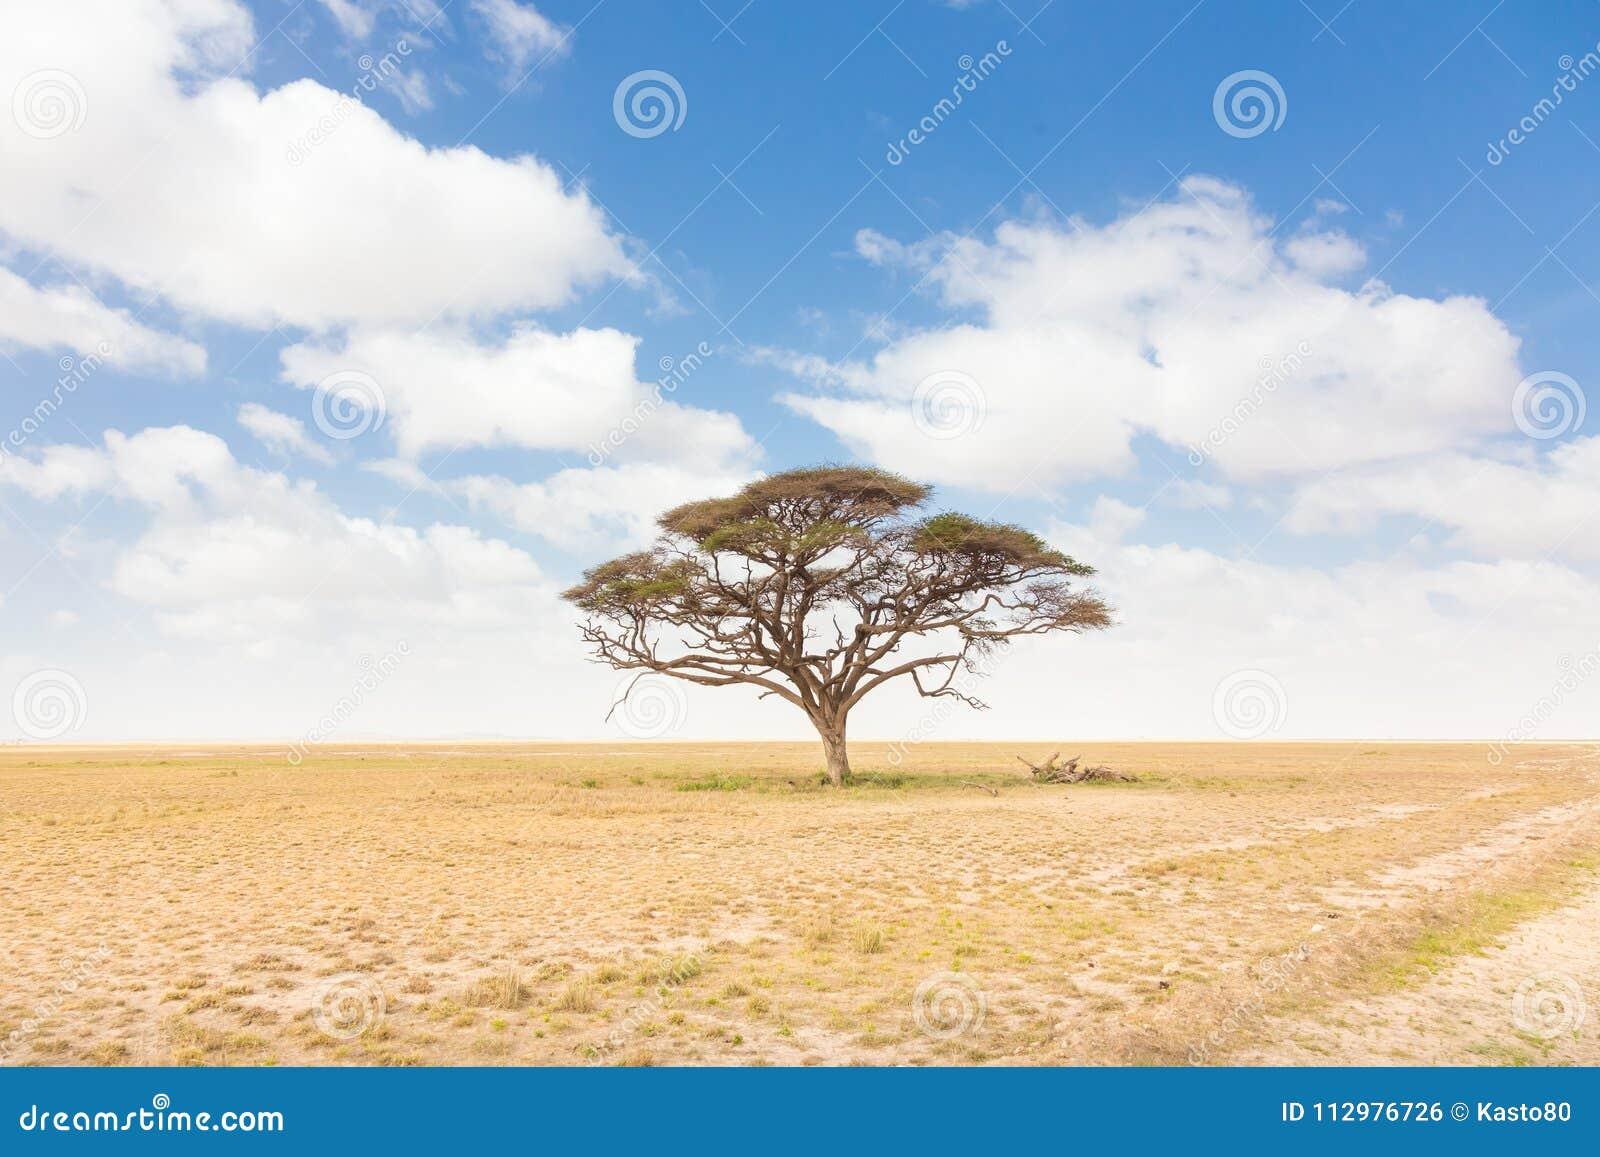 Solitary acacia tree in African savana plain in Kenya.